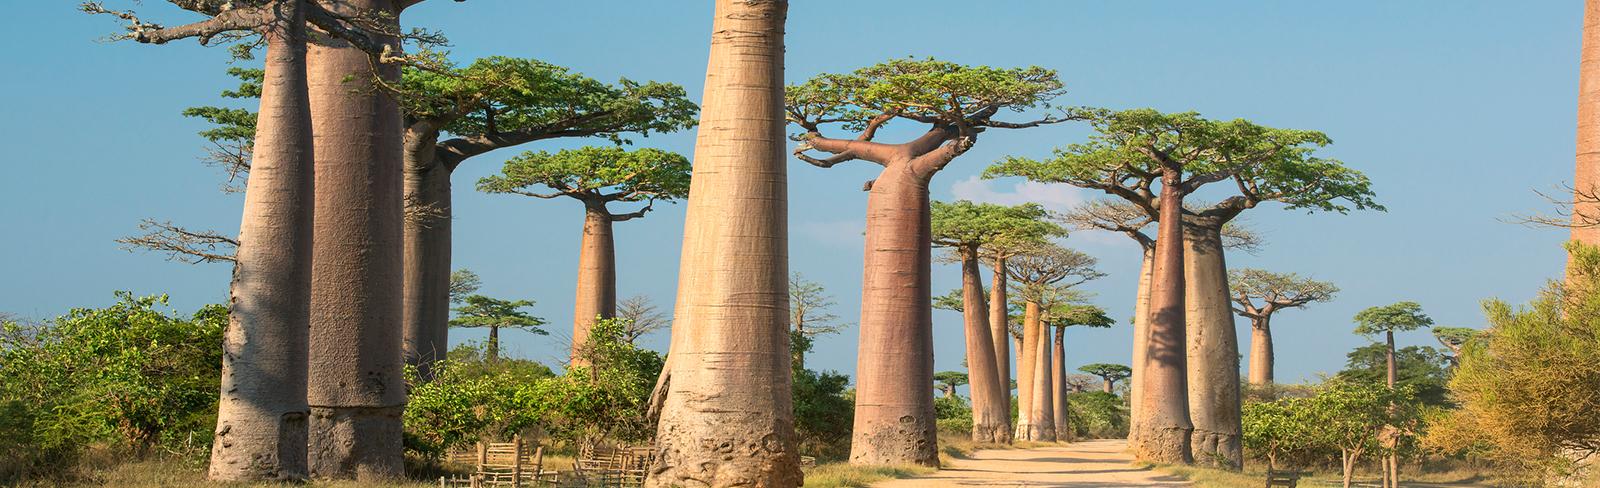 Madagascar_1600x488.jpg